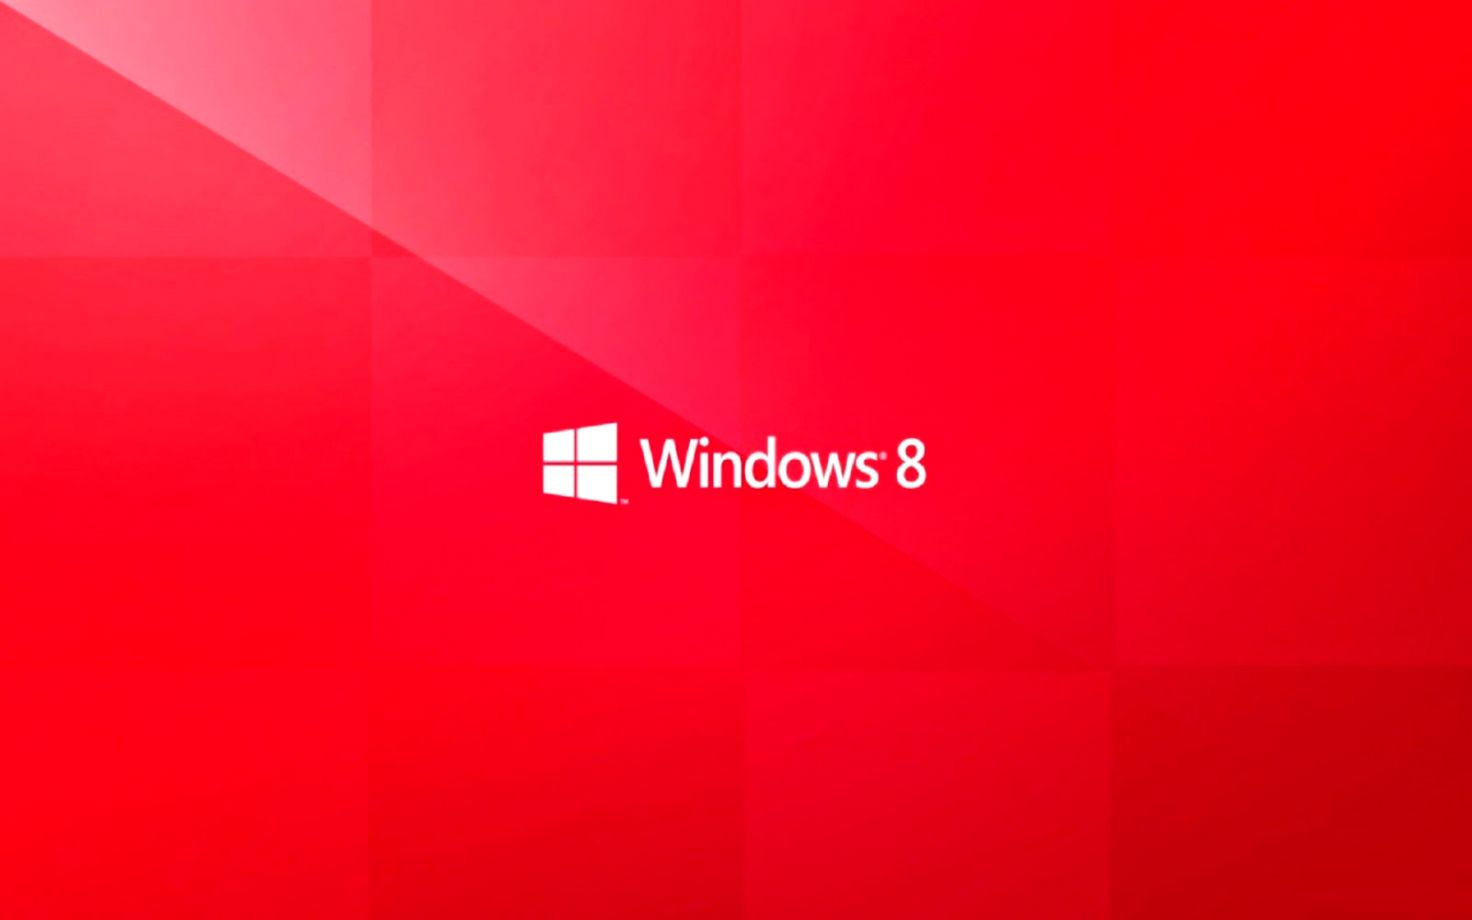 Best Windows 8 Background Hd Wallpaper Wallpapers Lock Screen 1472x920